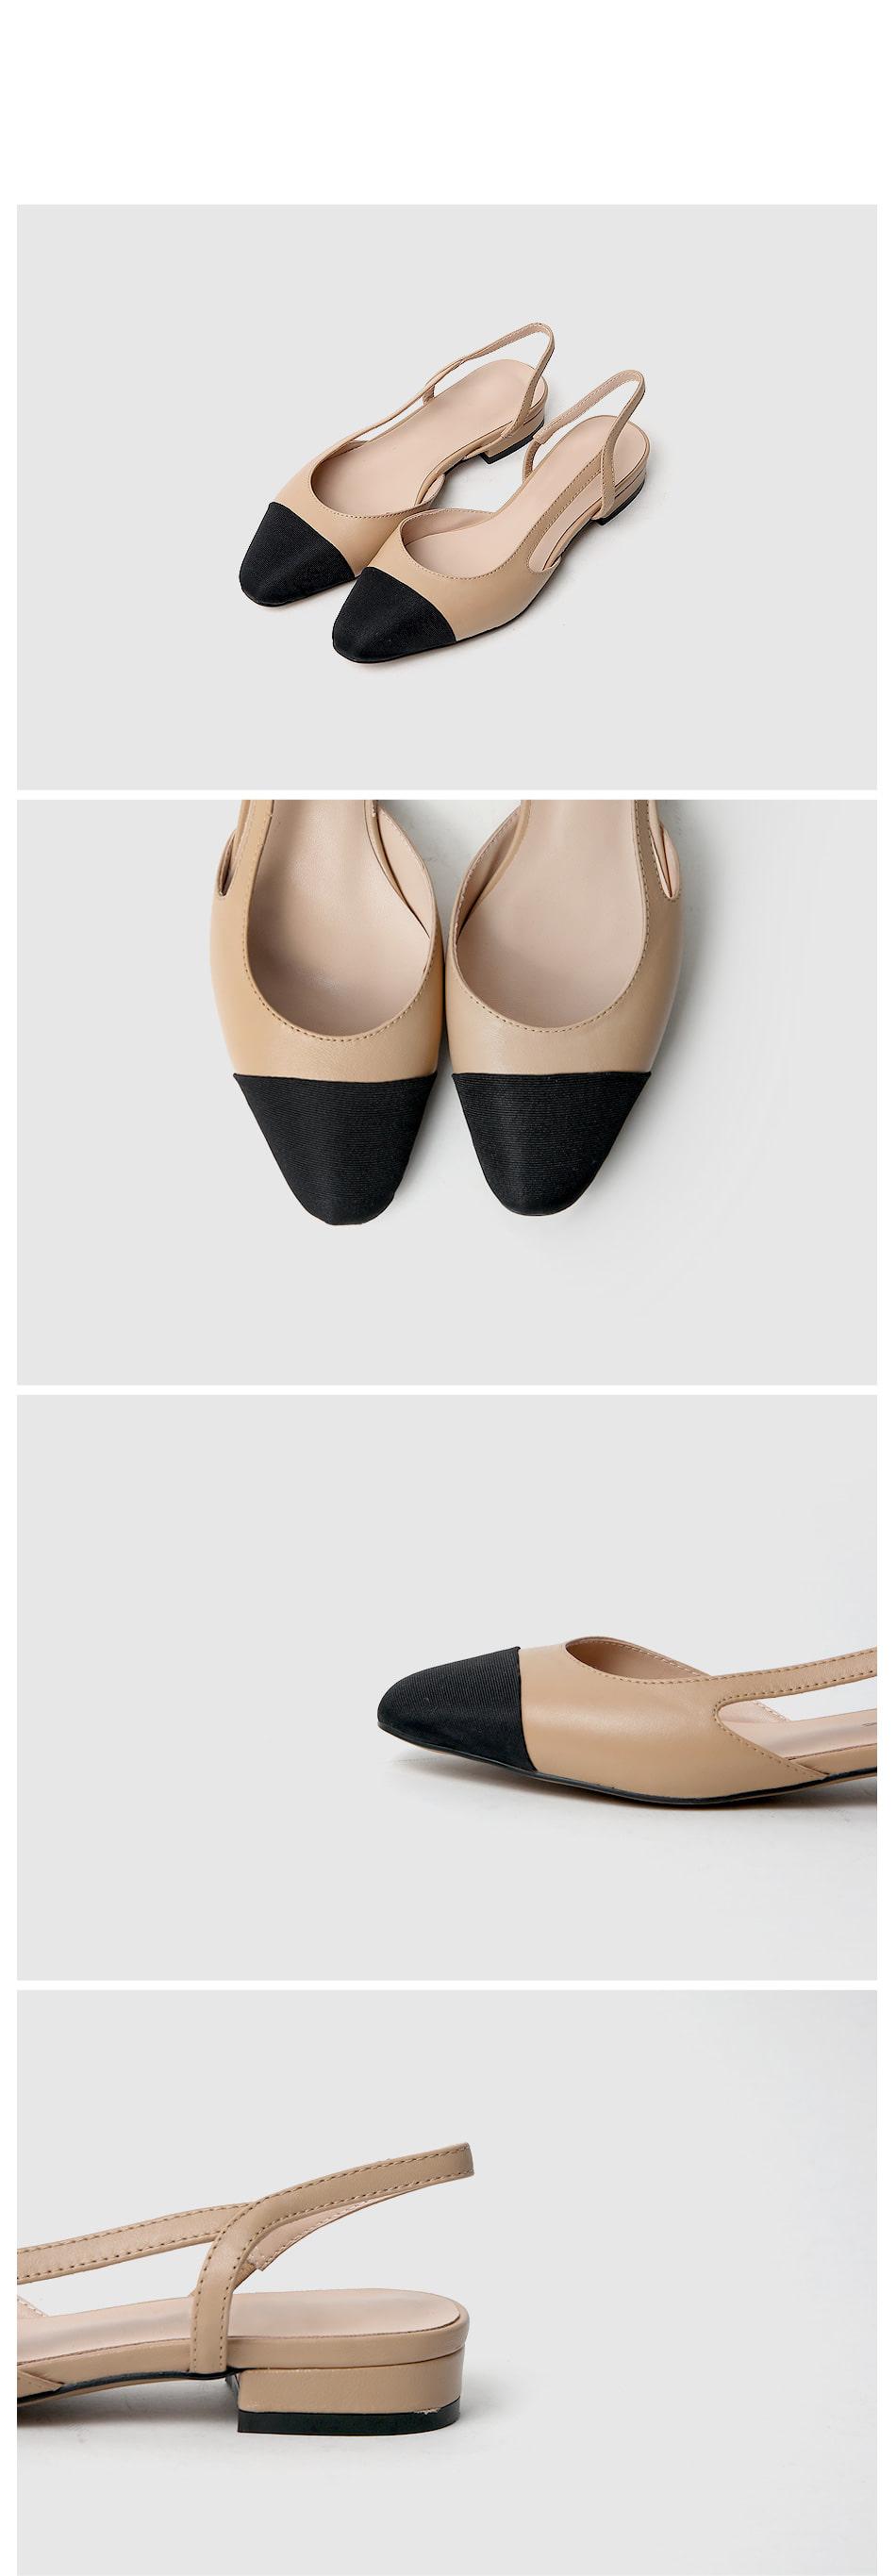 Nienta Leather Slingback Flat Shoes 2cm